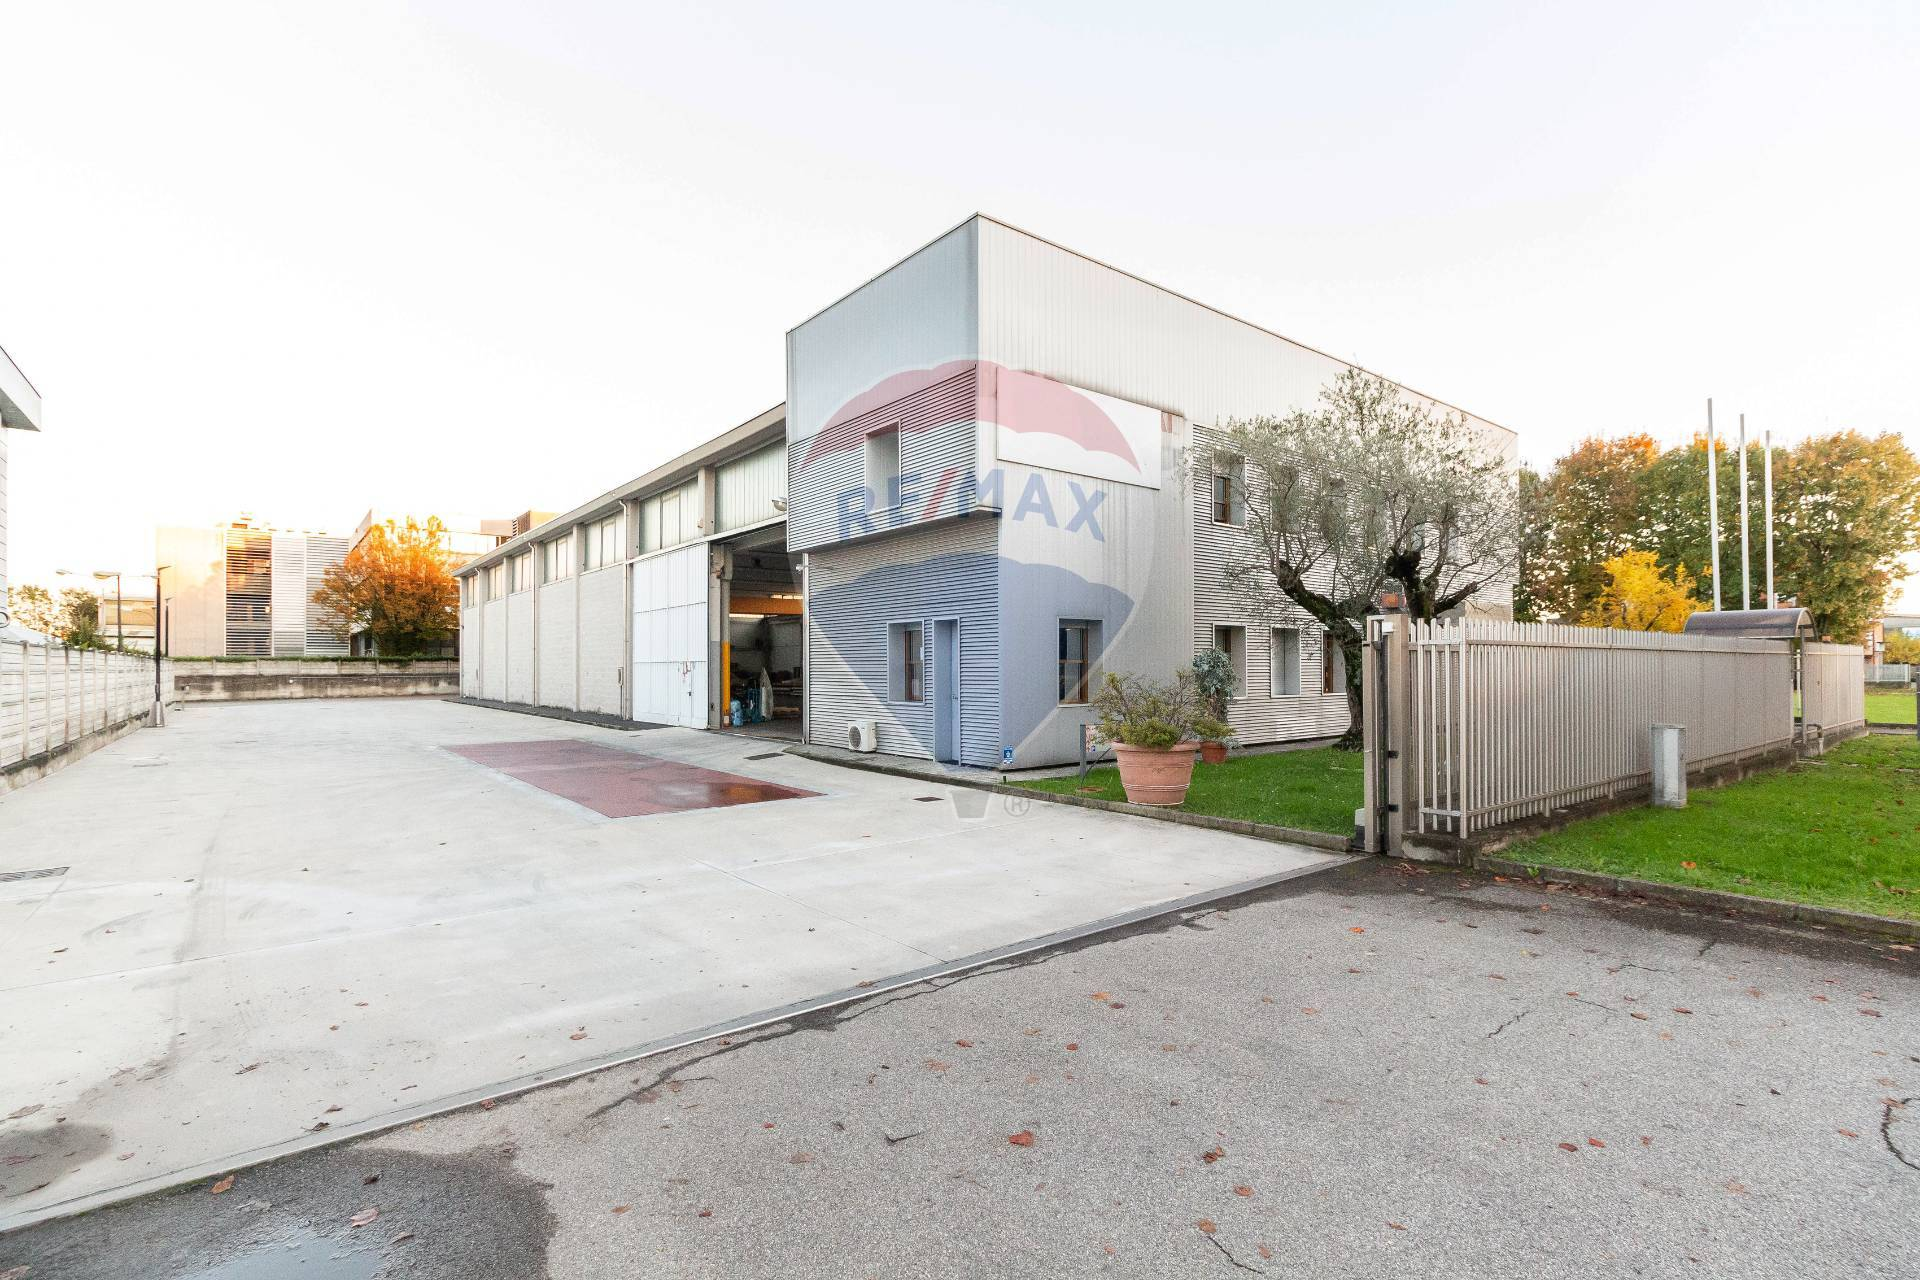 Vendita Capannone Commerciale/Industriale Cernusco sul Naviglio 283994